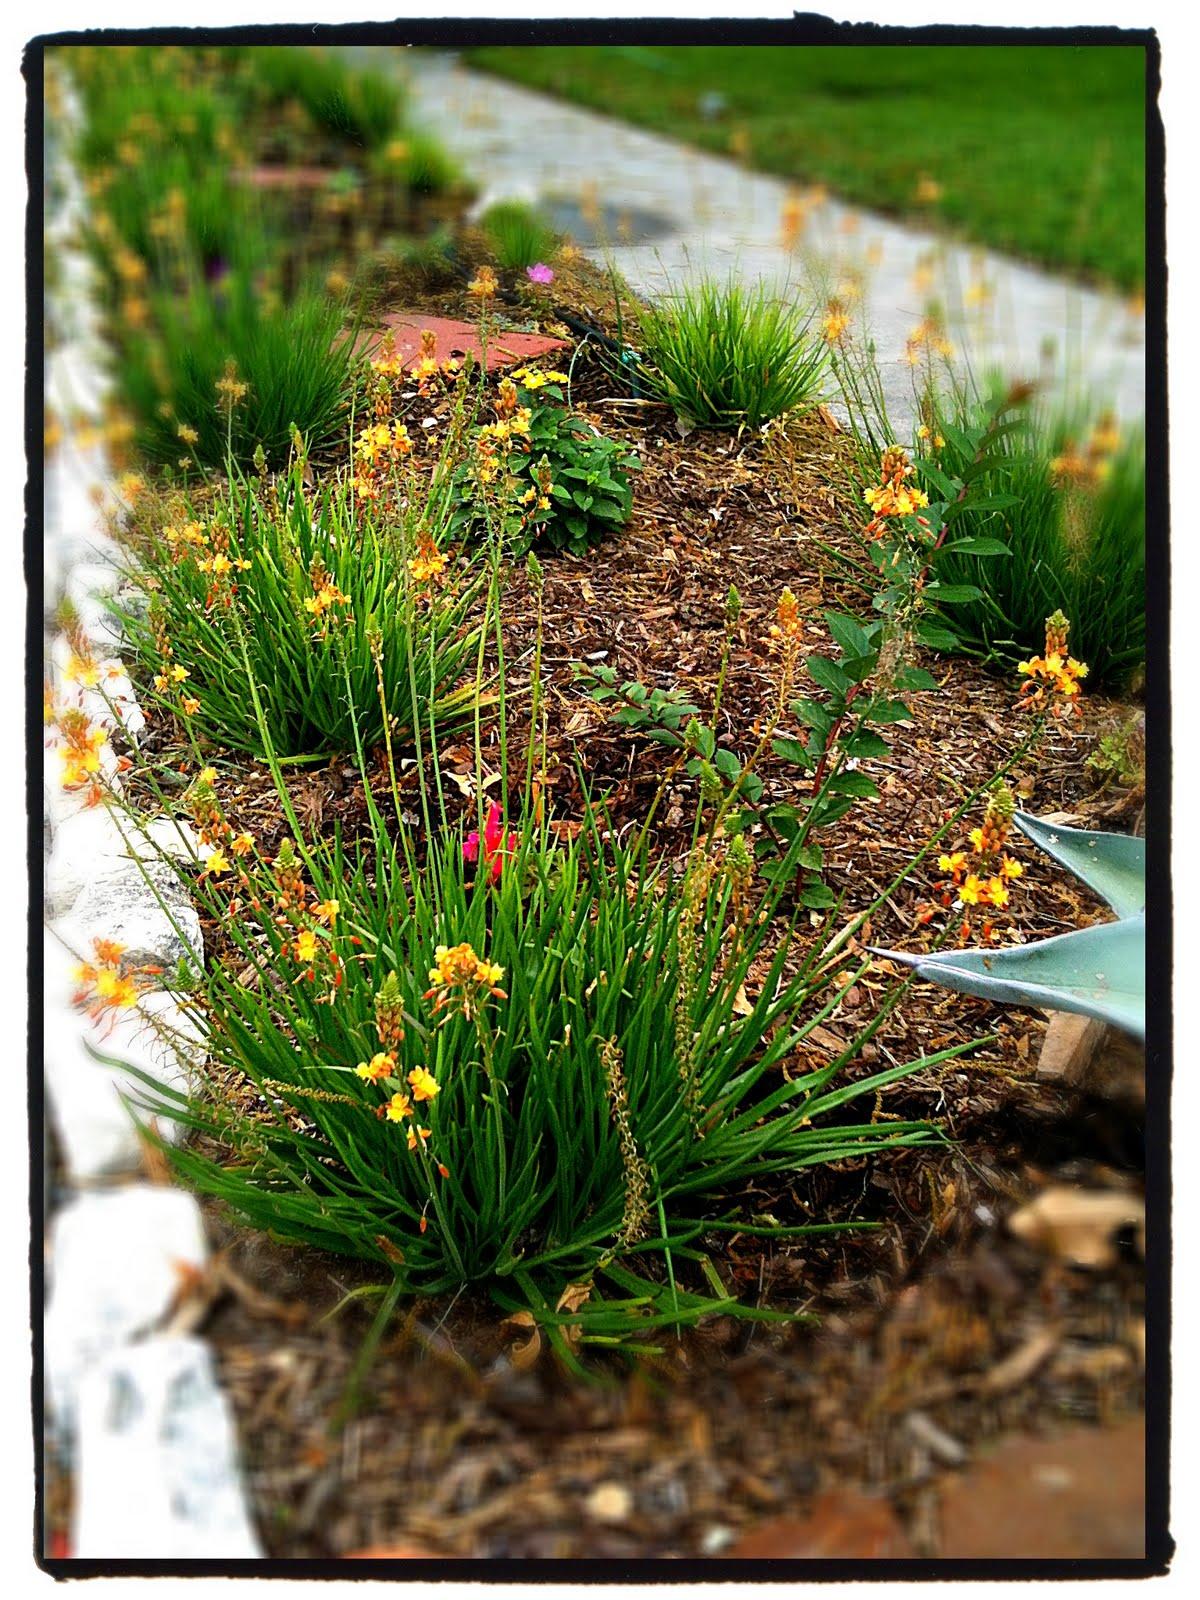 William caldera curbside garden update for Curbside garden designs